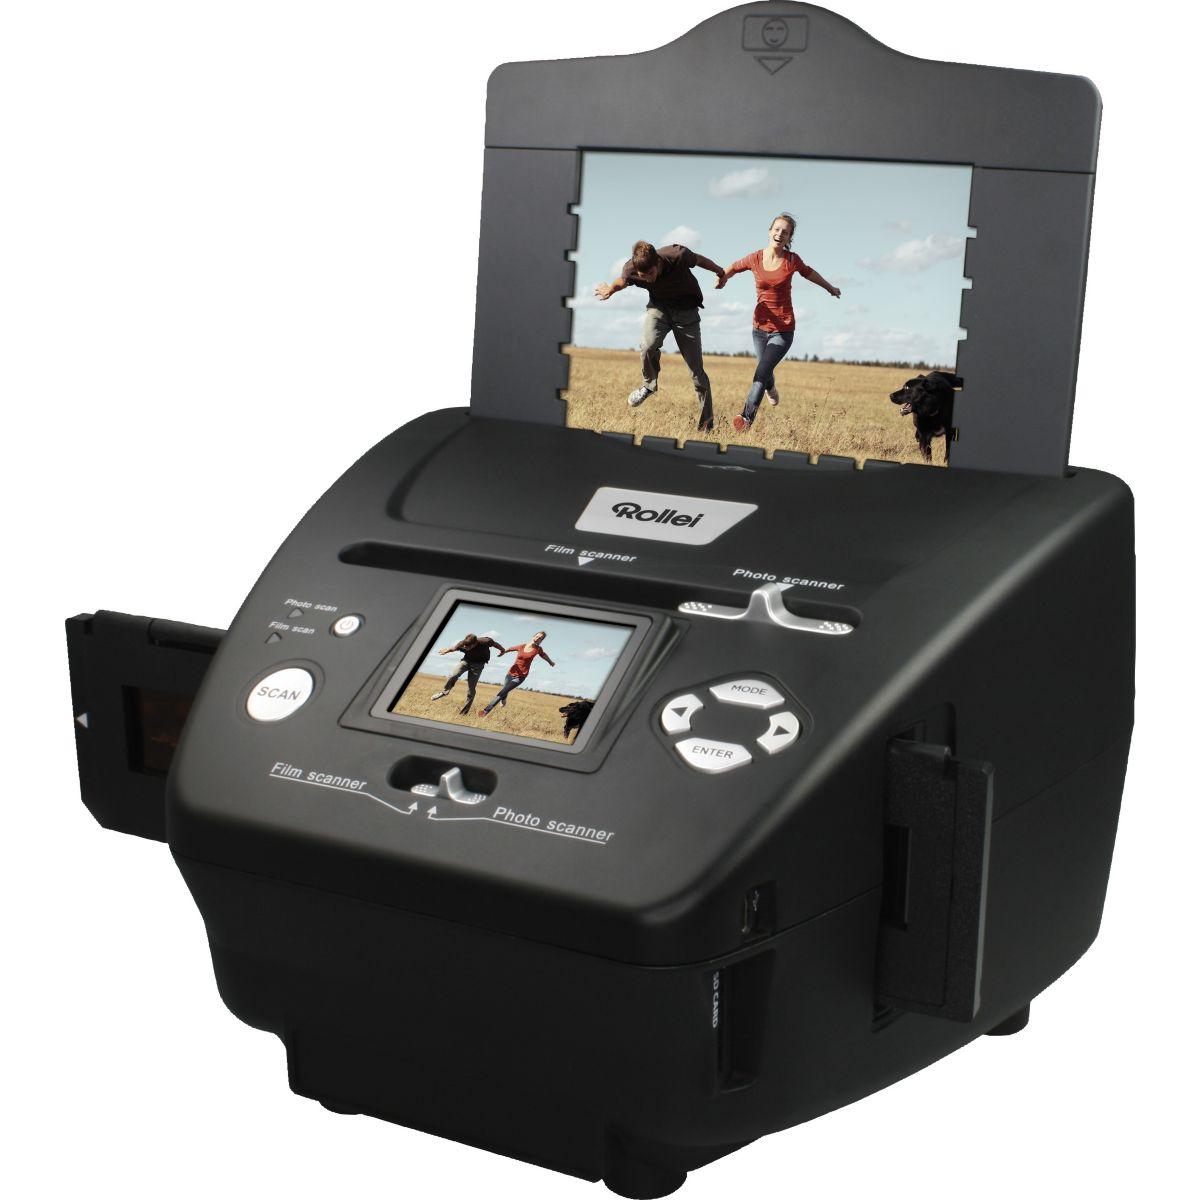 Scanner portable rollei pdf s240 se - livraison offerte : code liv (photo)